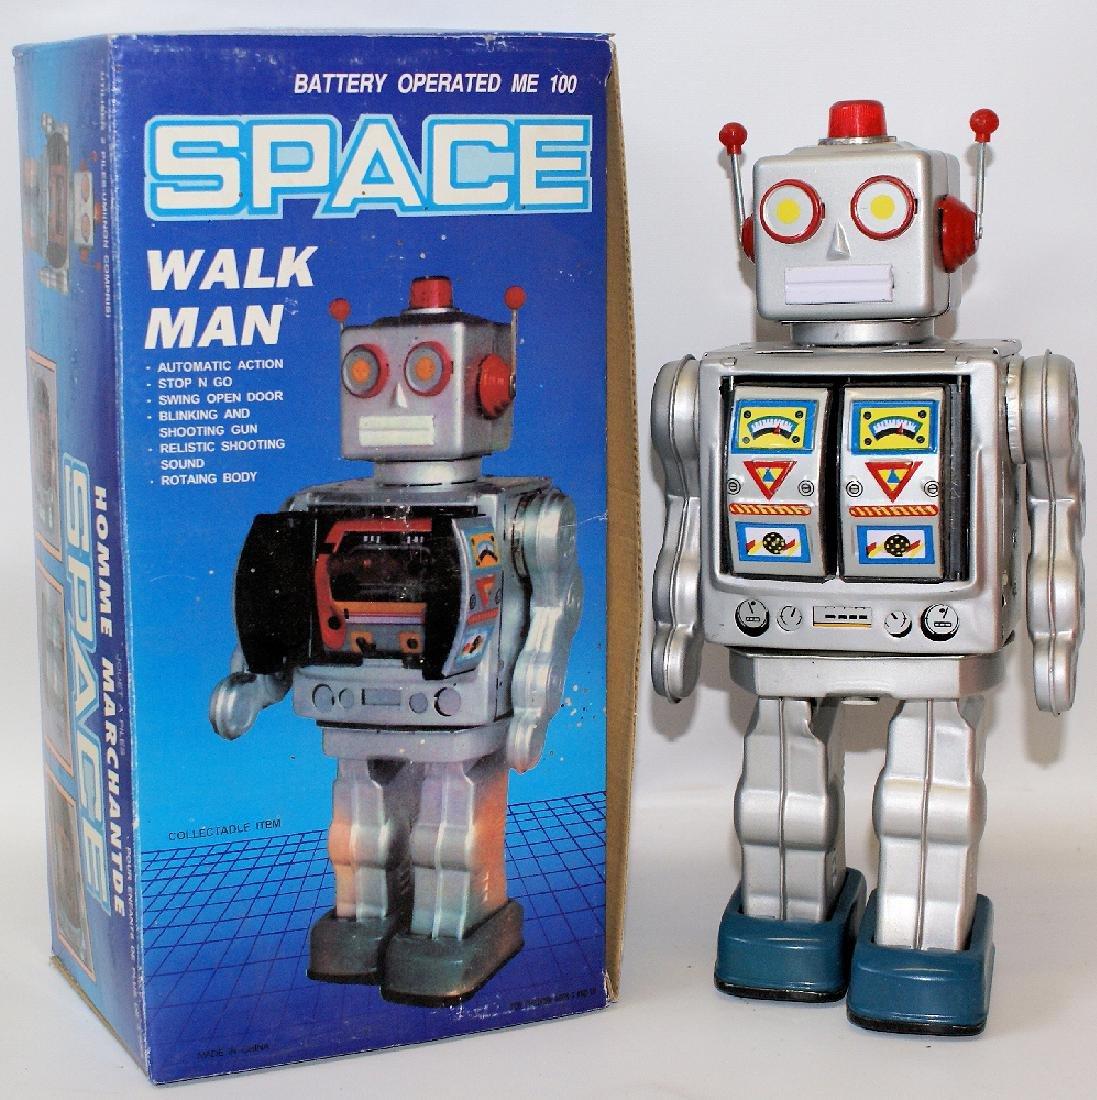 1990's Tin B.O. Silver SPACE 'WALK MAN' ROBOT in Box